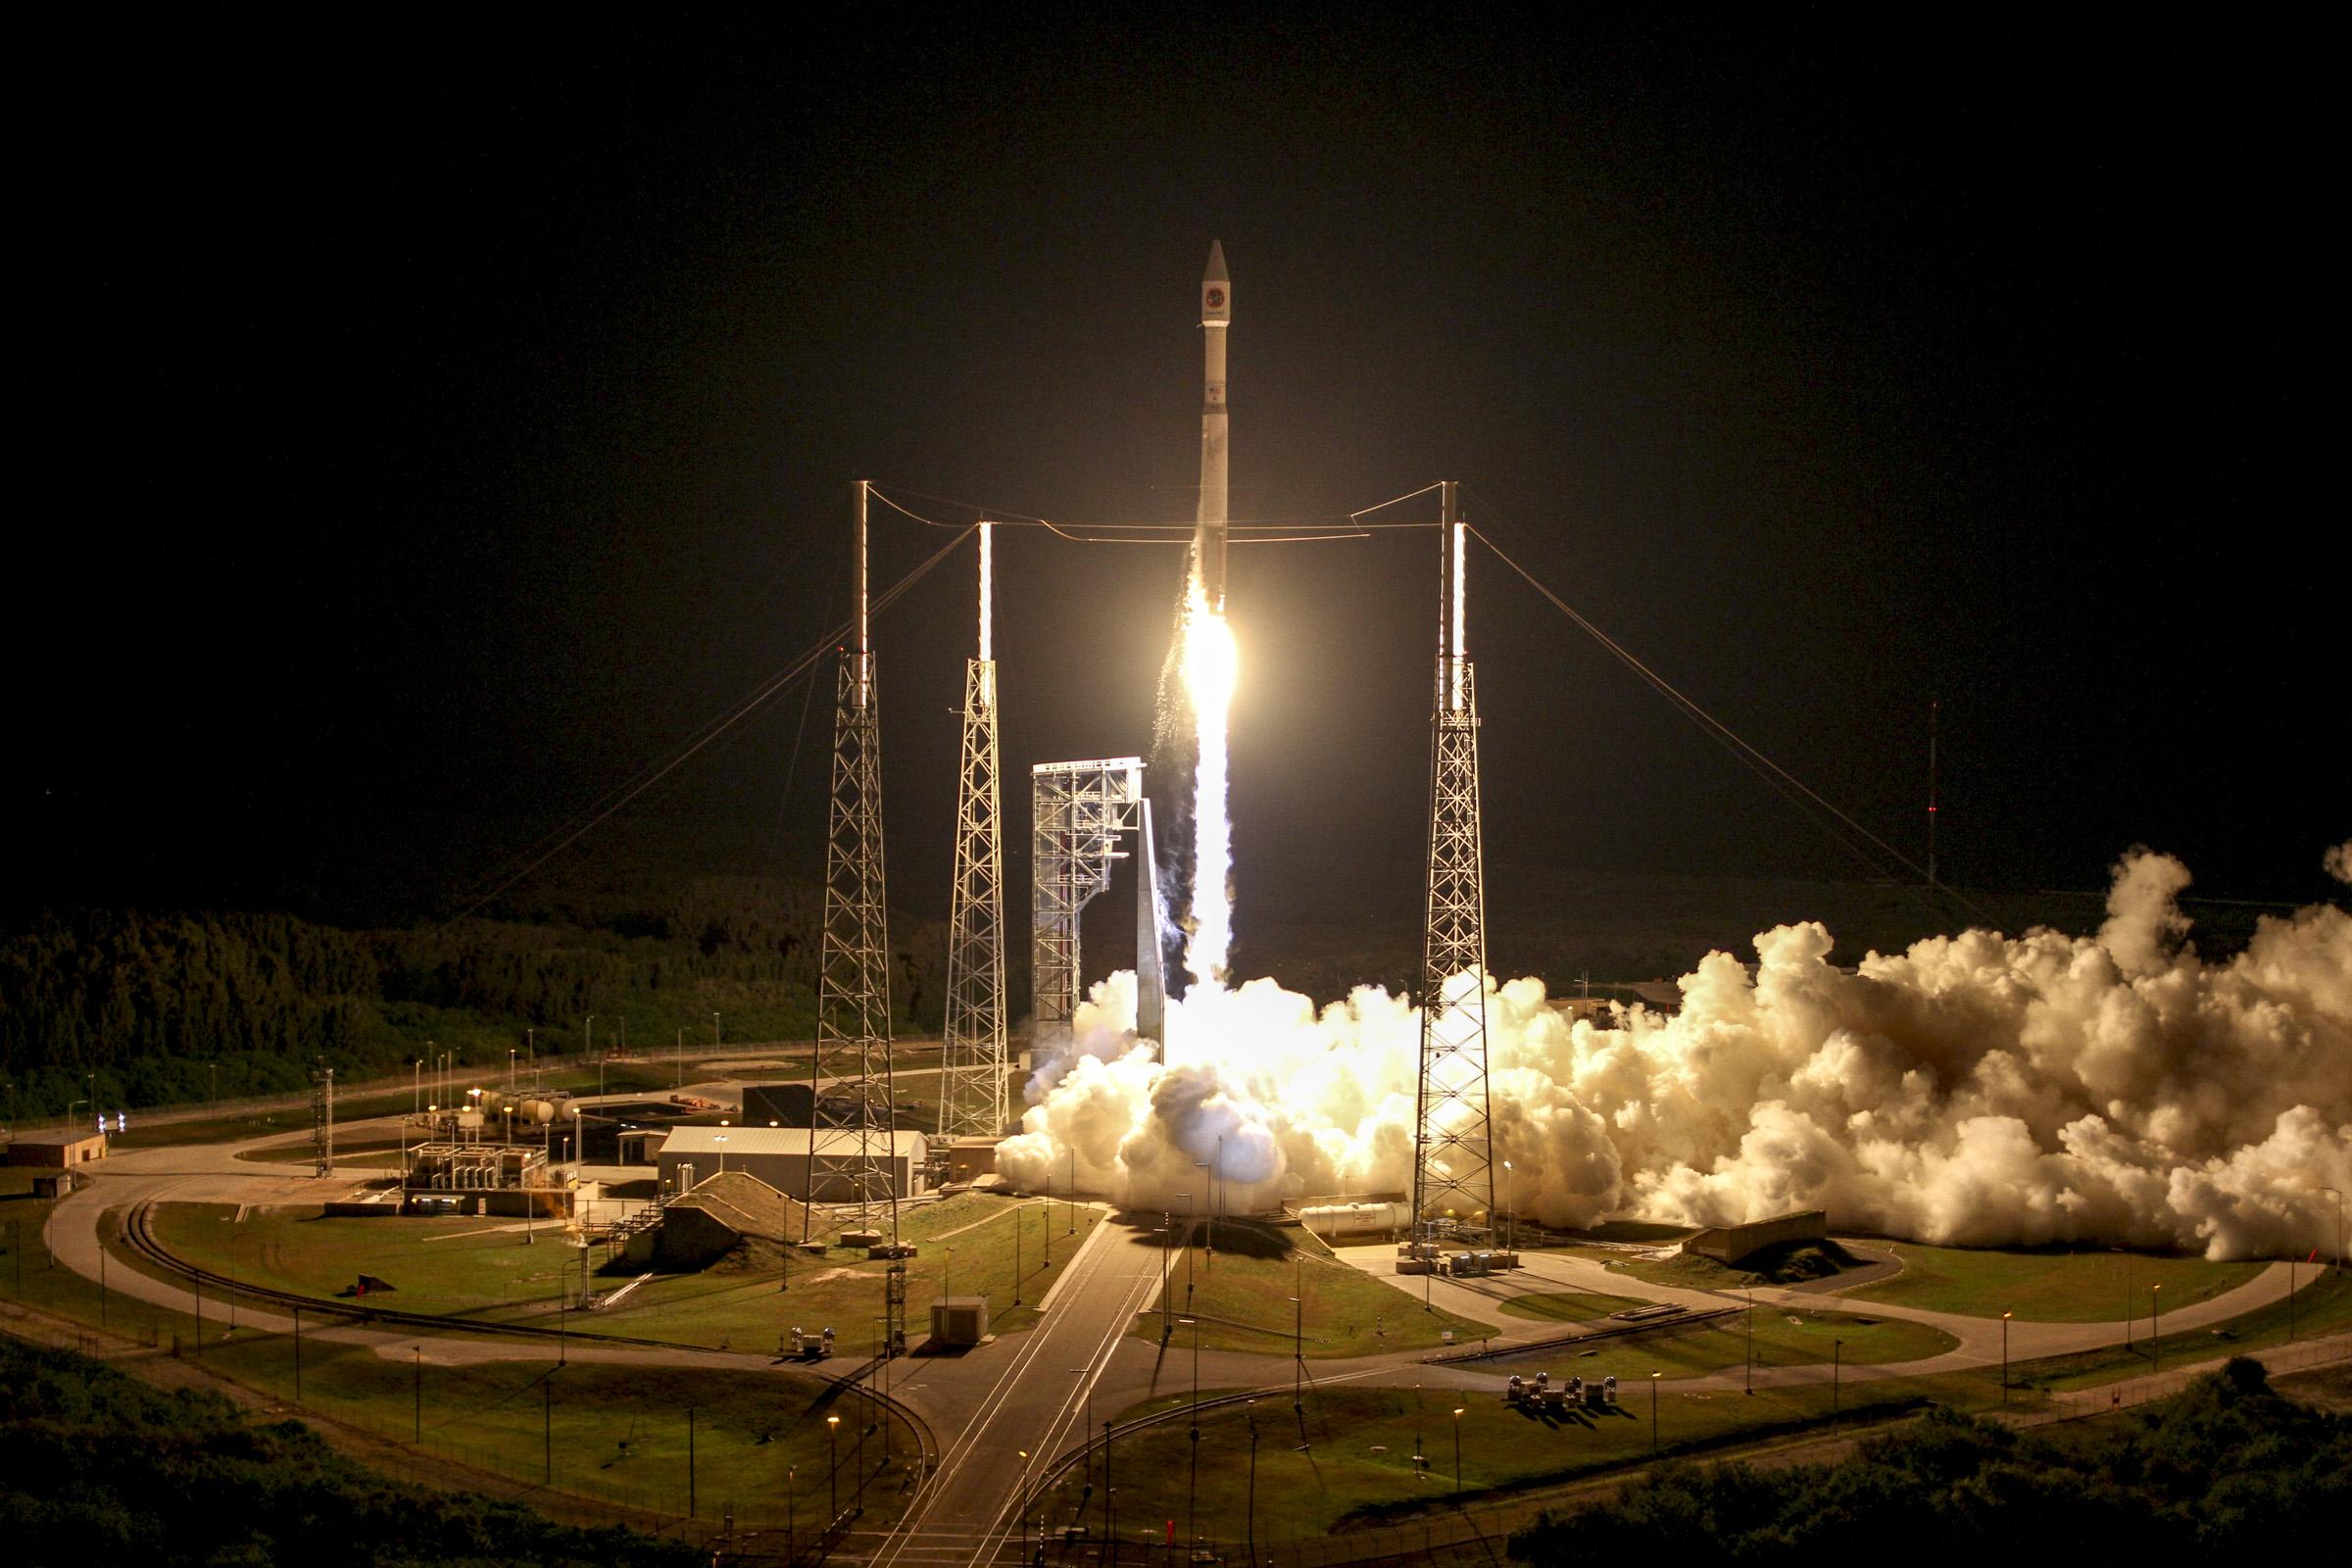 Cygnus Atlas Launch Interpolation Lanczos Downsize 660 Photos Orbital Atks Oa Ase Lights